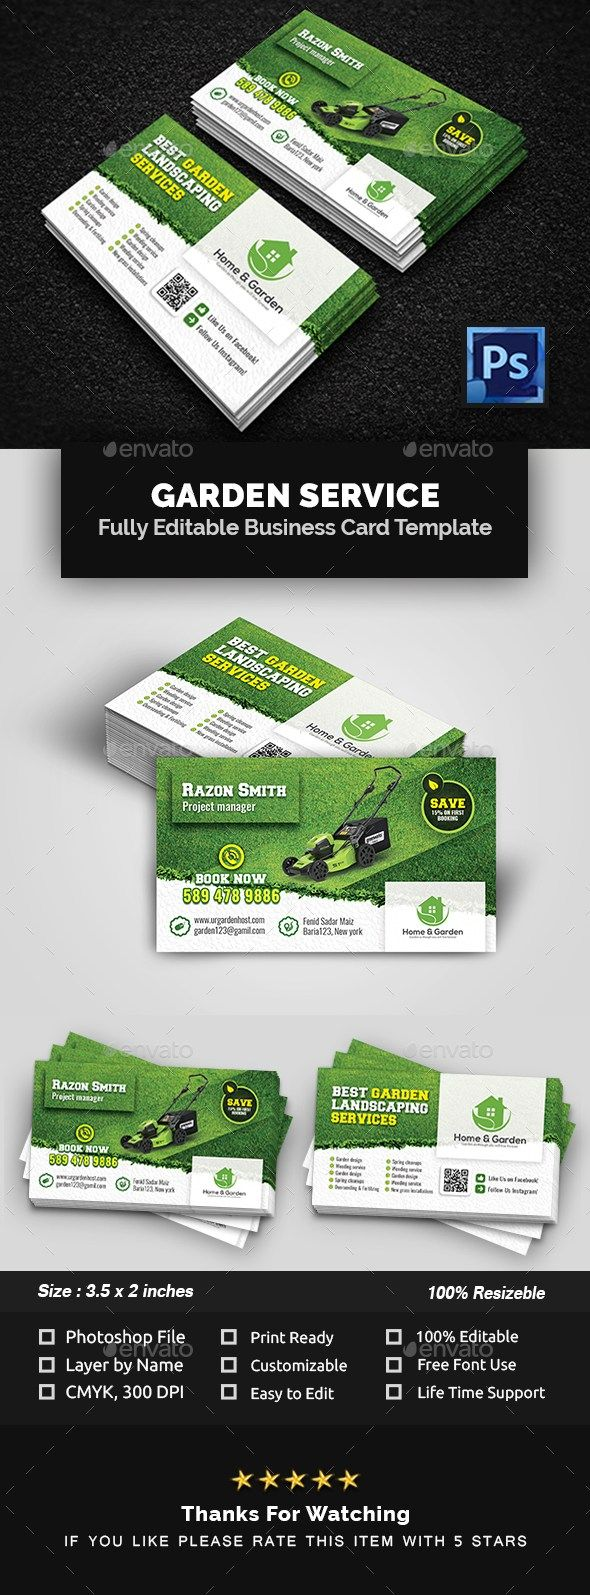 Garden Landscape Business Card Template Businesscardtemplate Businesscards Graphi Business Card Template Lawn Care Business Cards Landscaping Business Cards